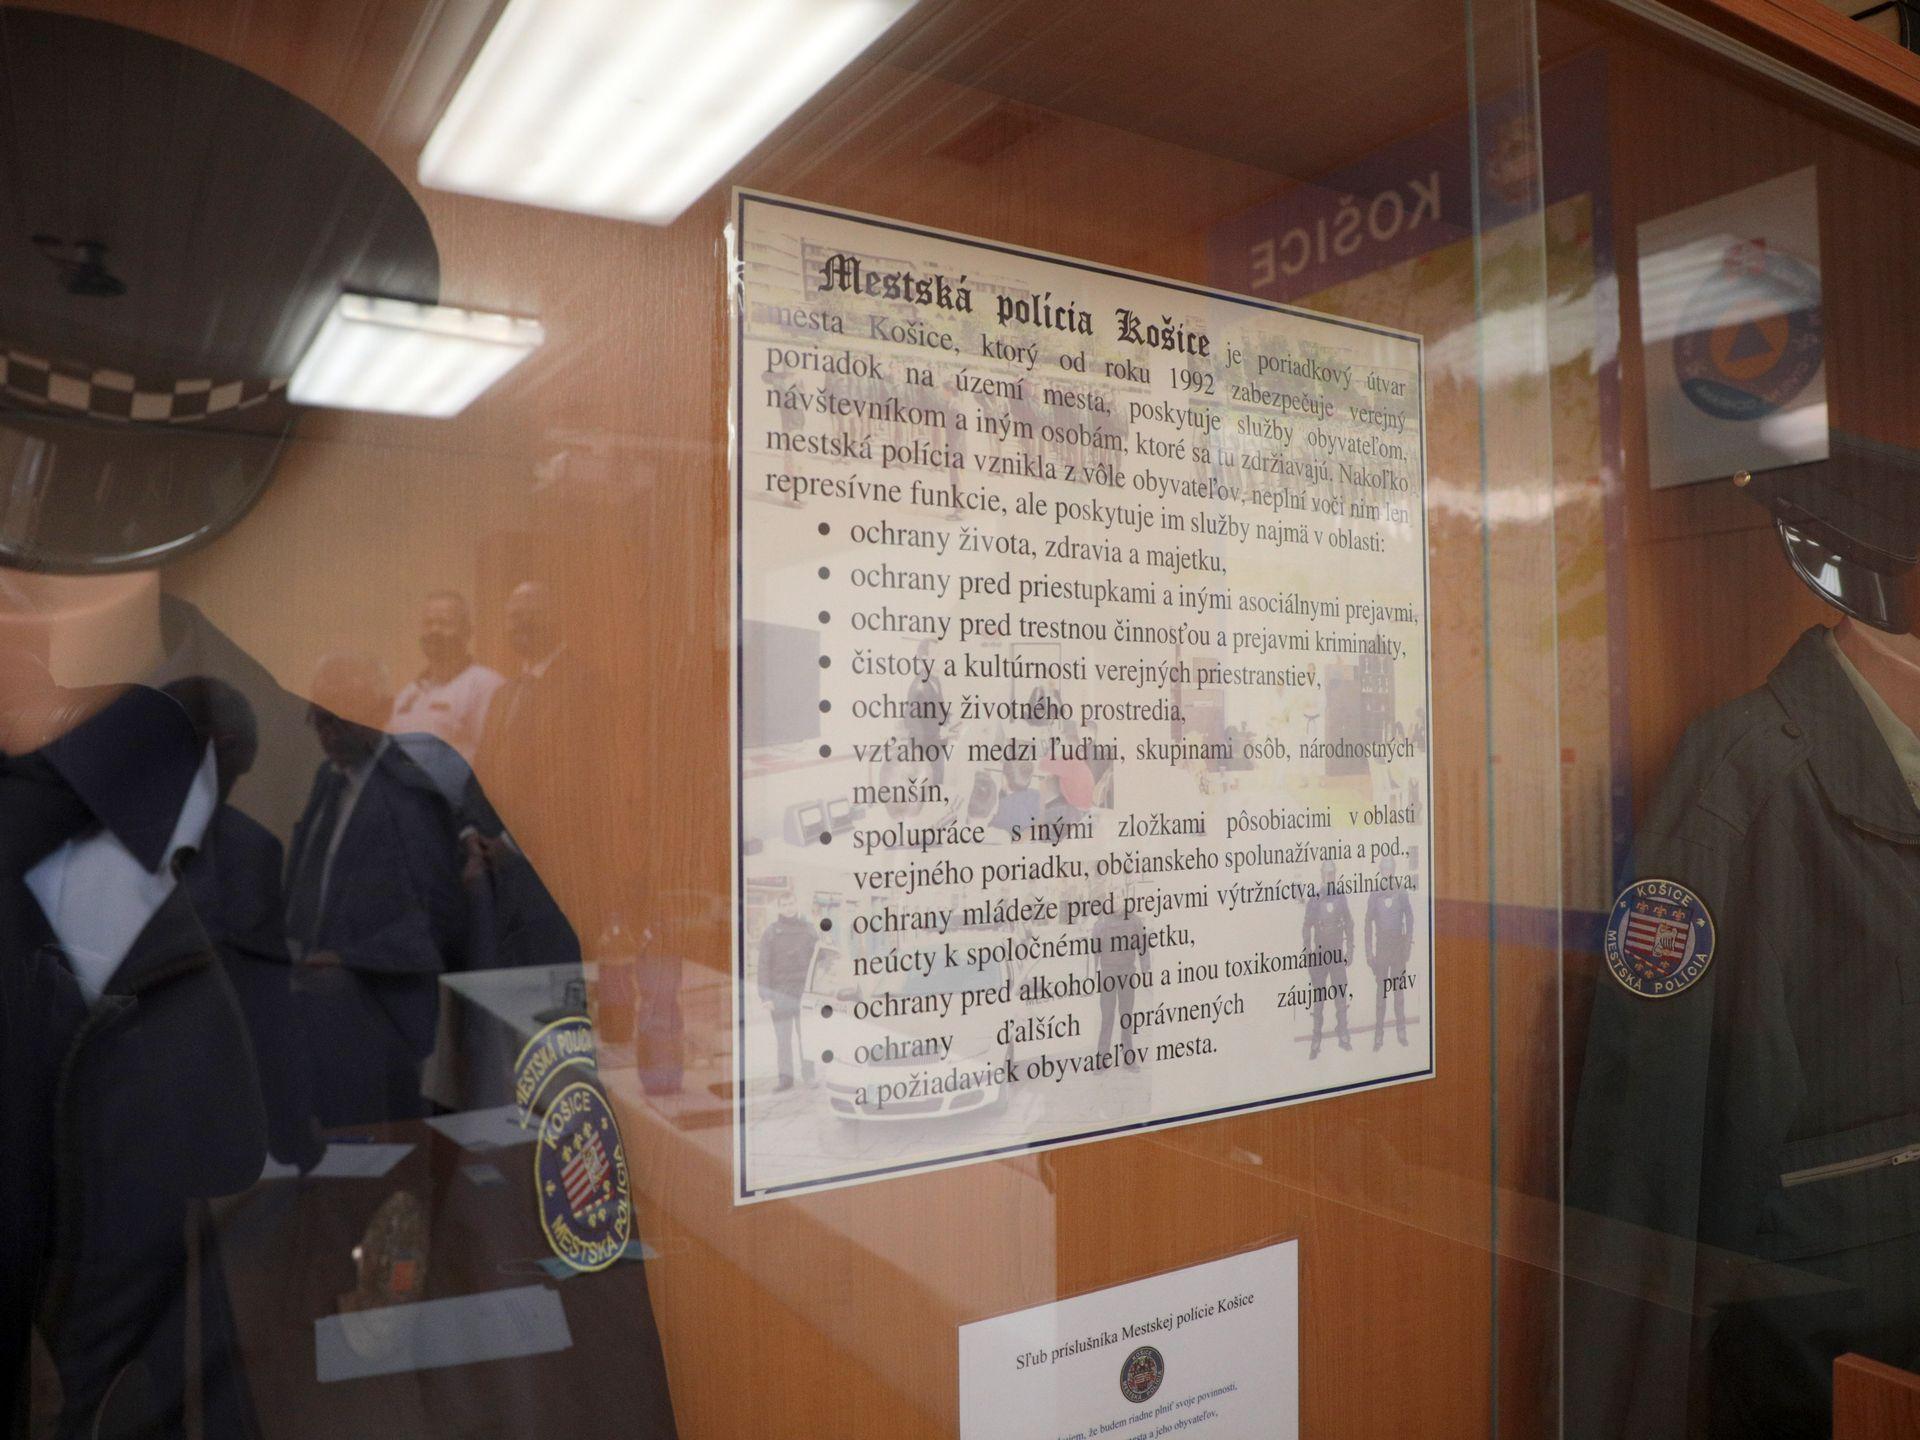 PoliciaAbsolventi21Jul26